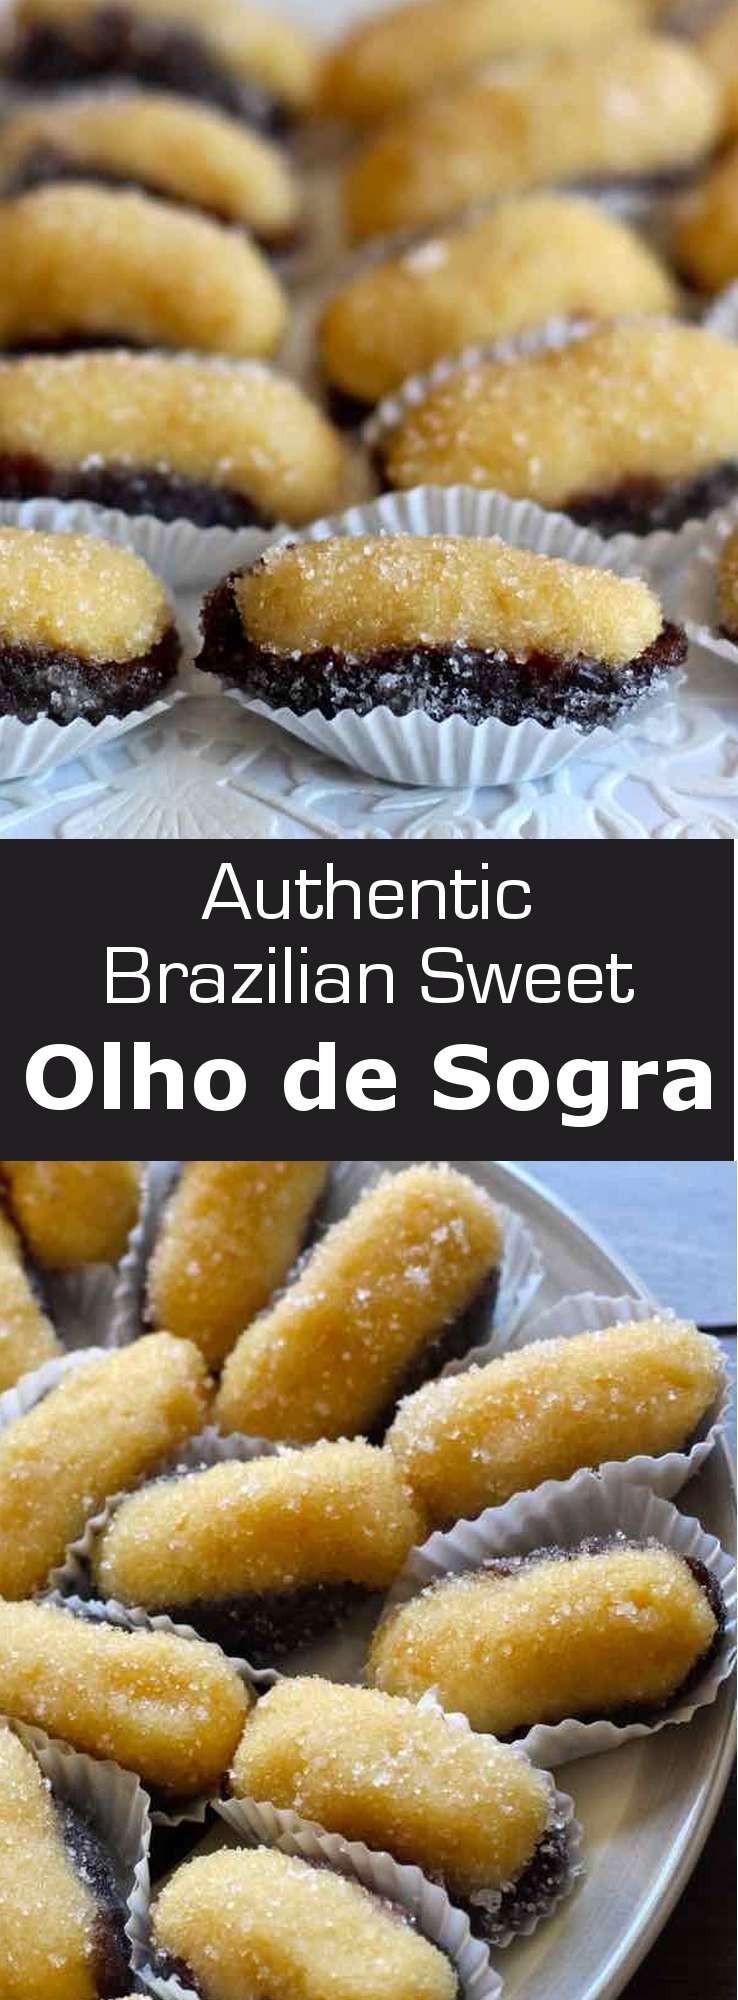 Brazilian Christmas Desserts  Olho de Sogra Authentic Brazilian Recipe